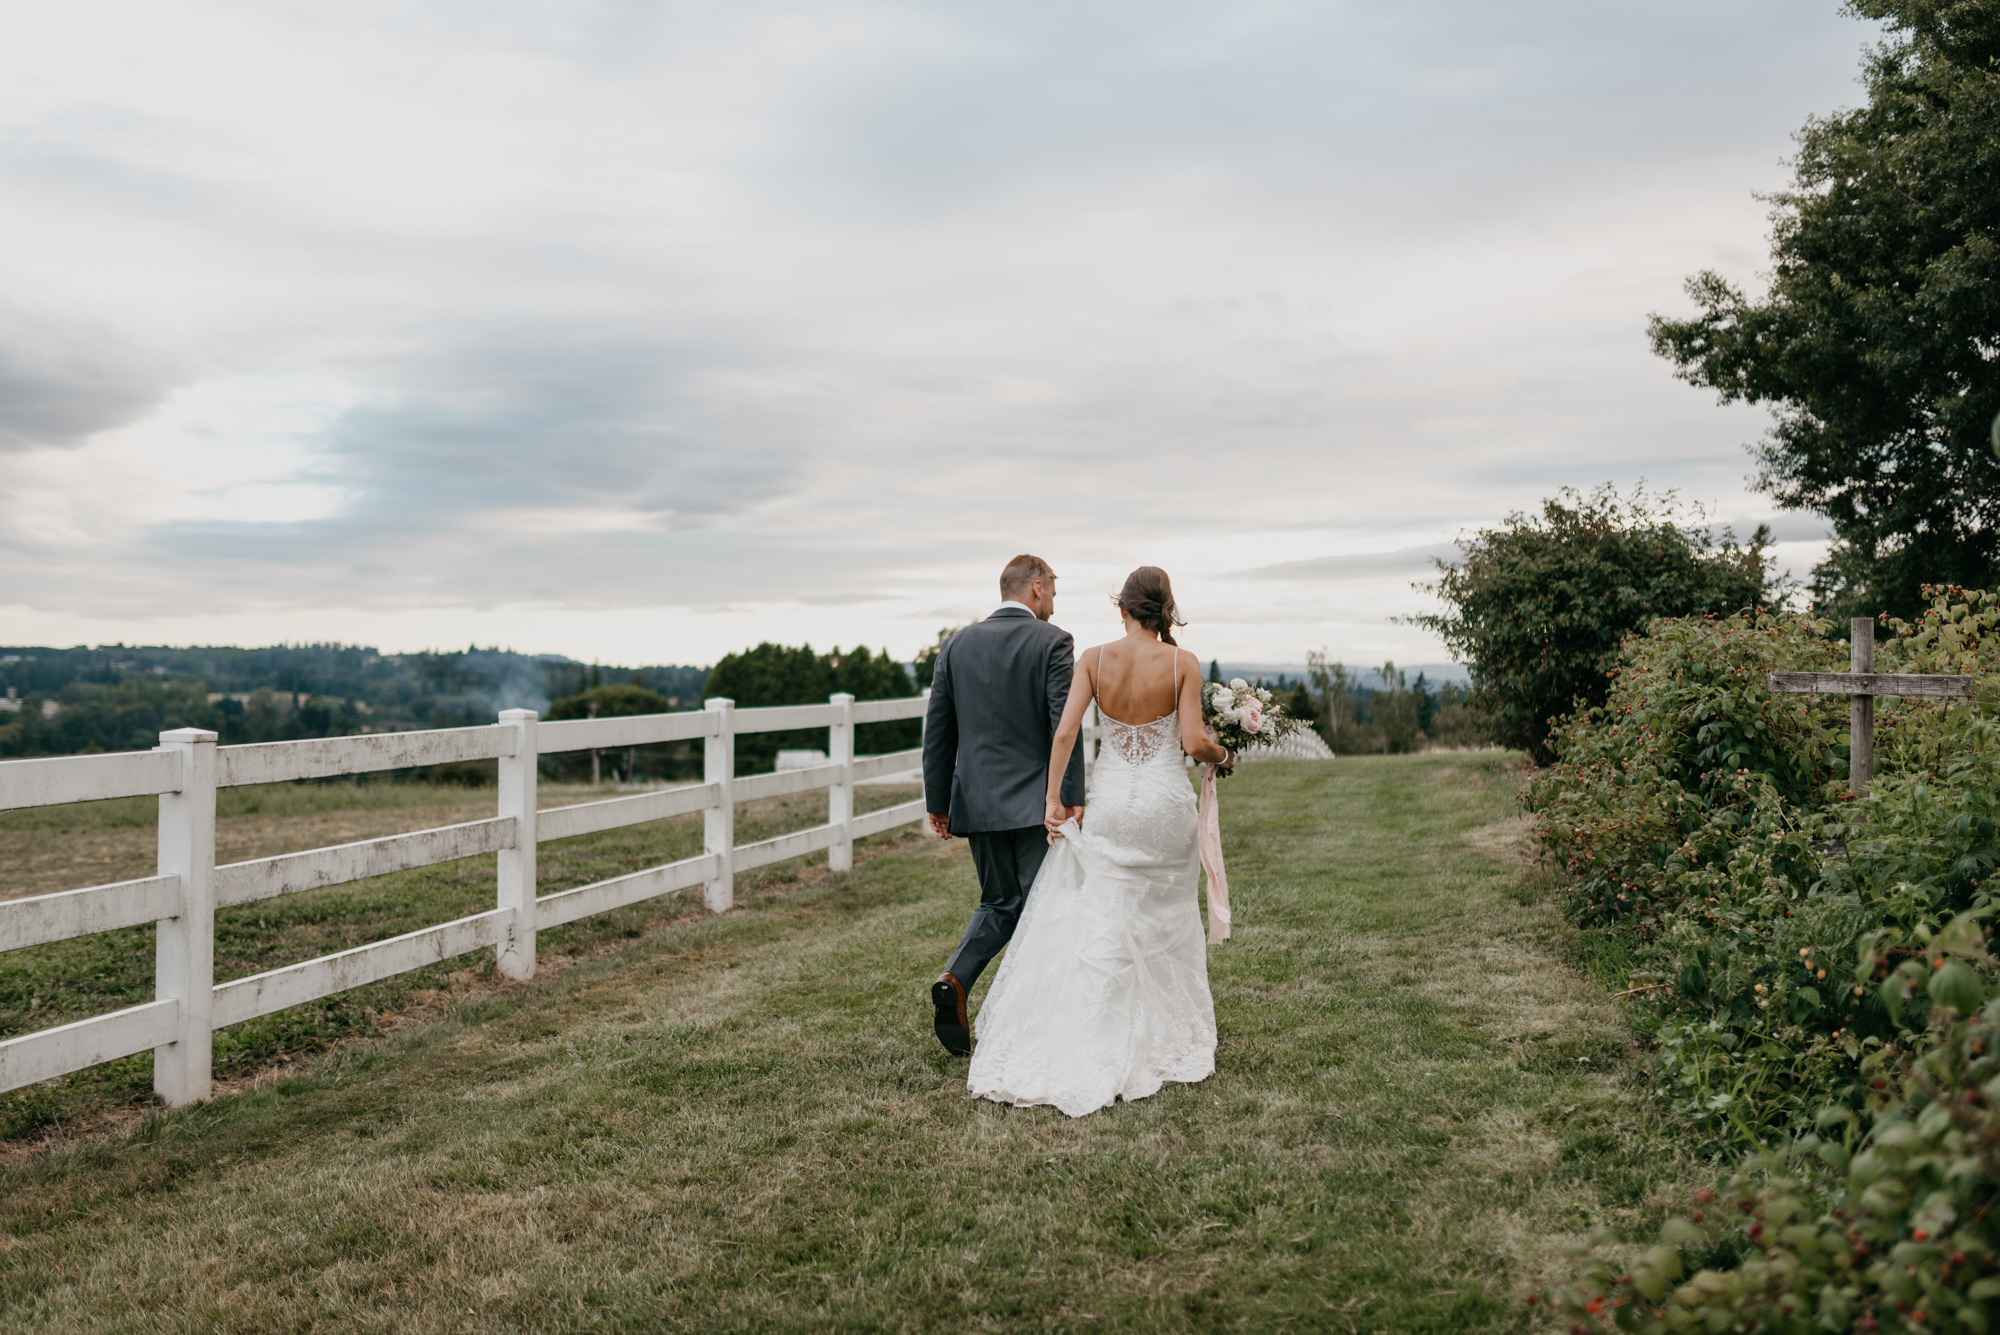 169-barn-kestrel-portland-northwest-horse-sunset-wedding.jpg